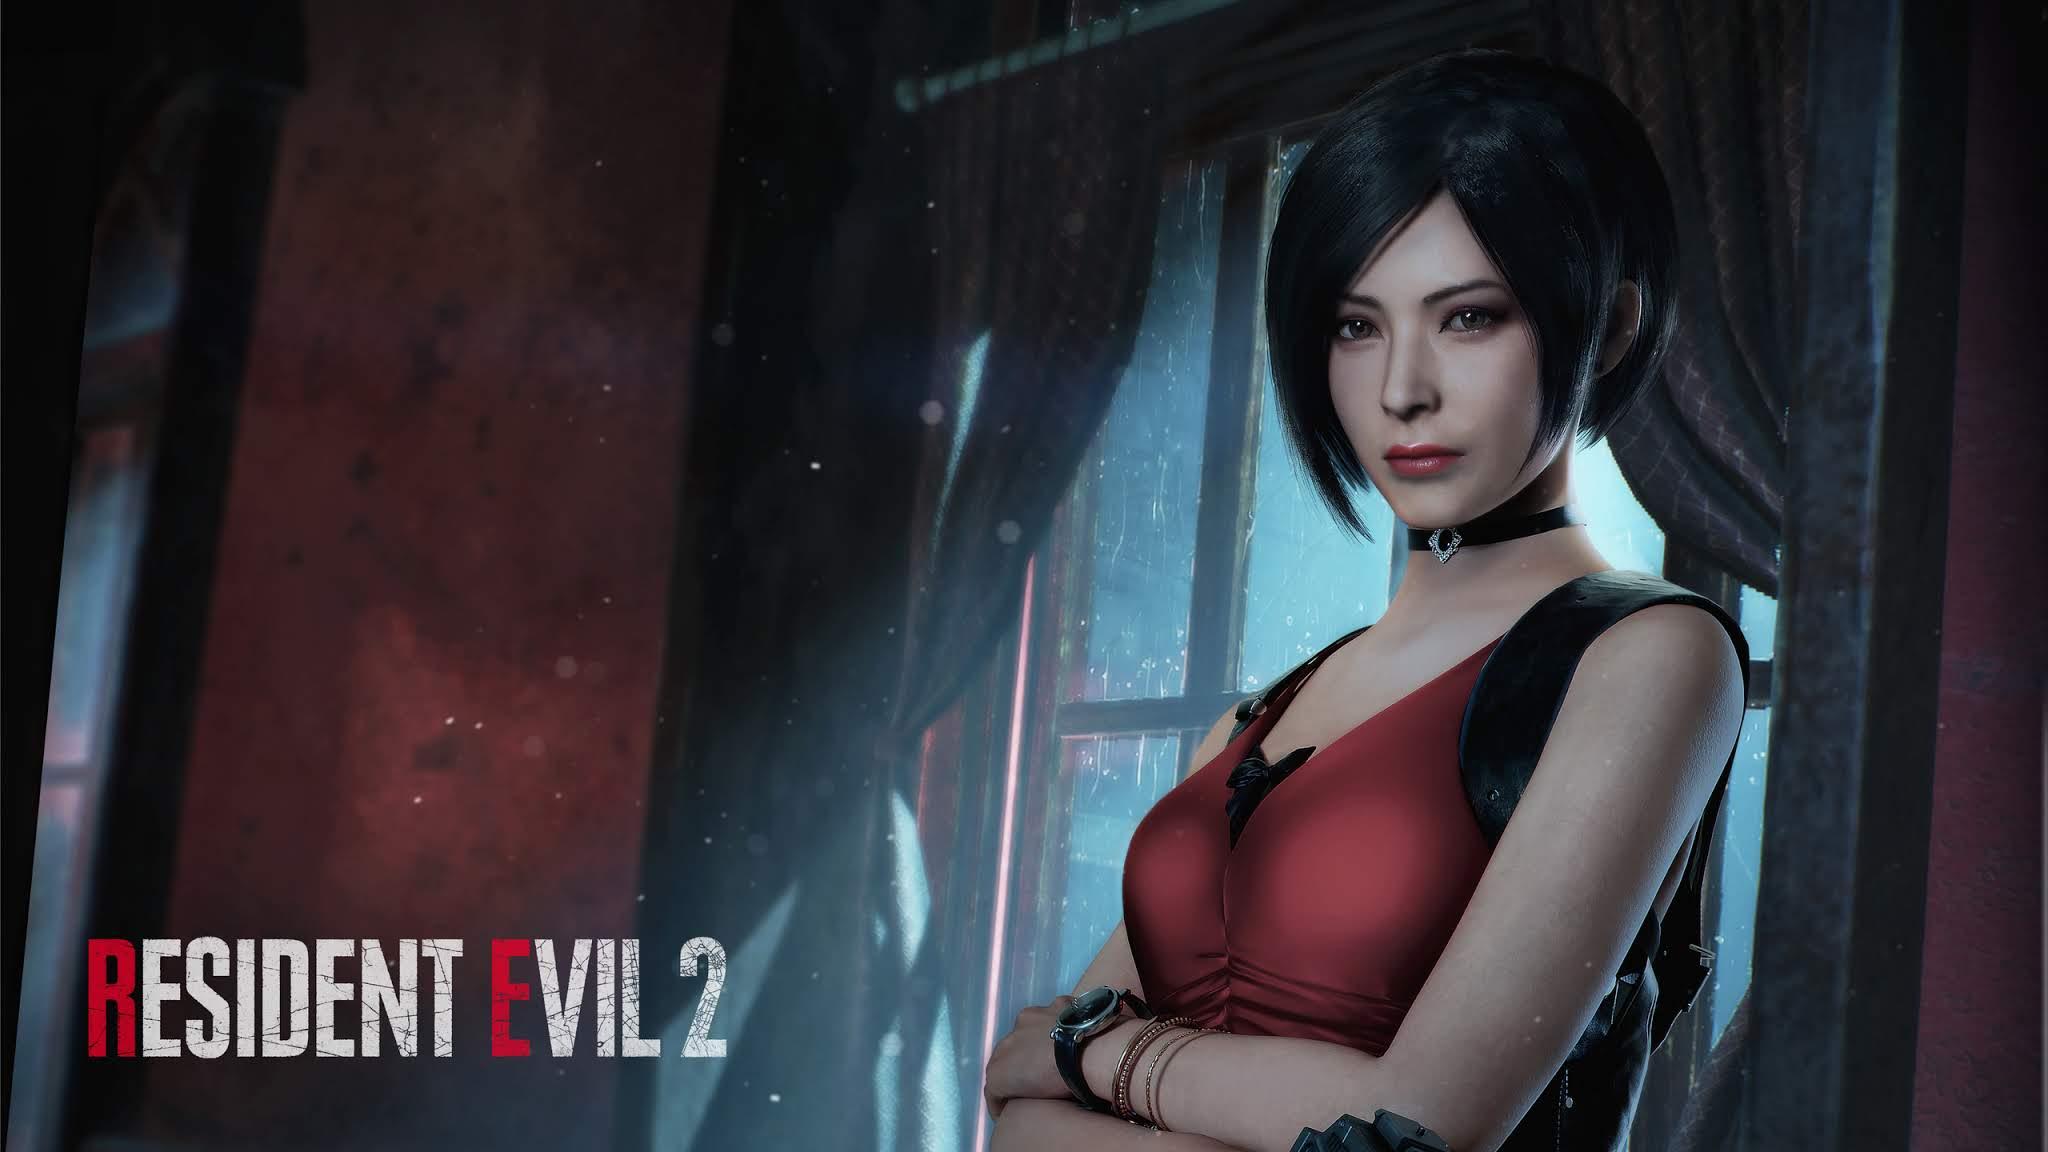 Ada Wong Resident Evil 2 Wallpaper